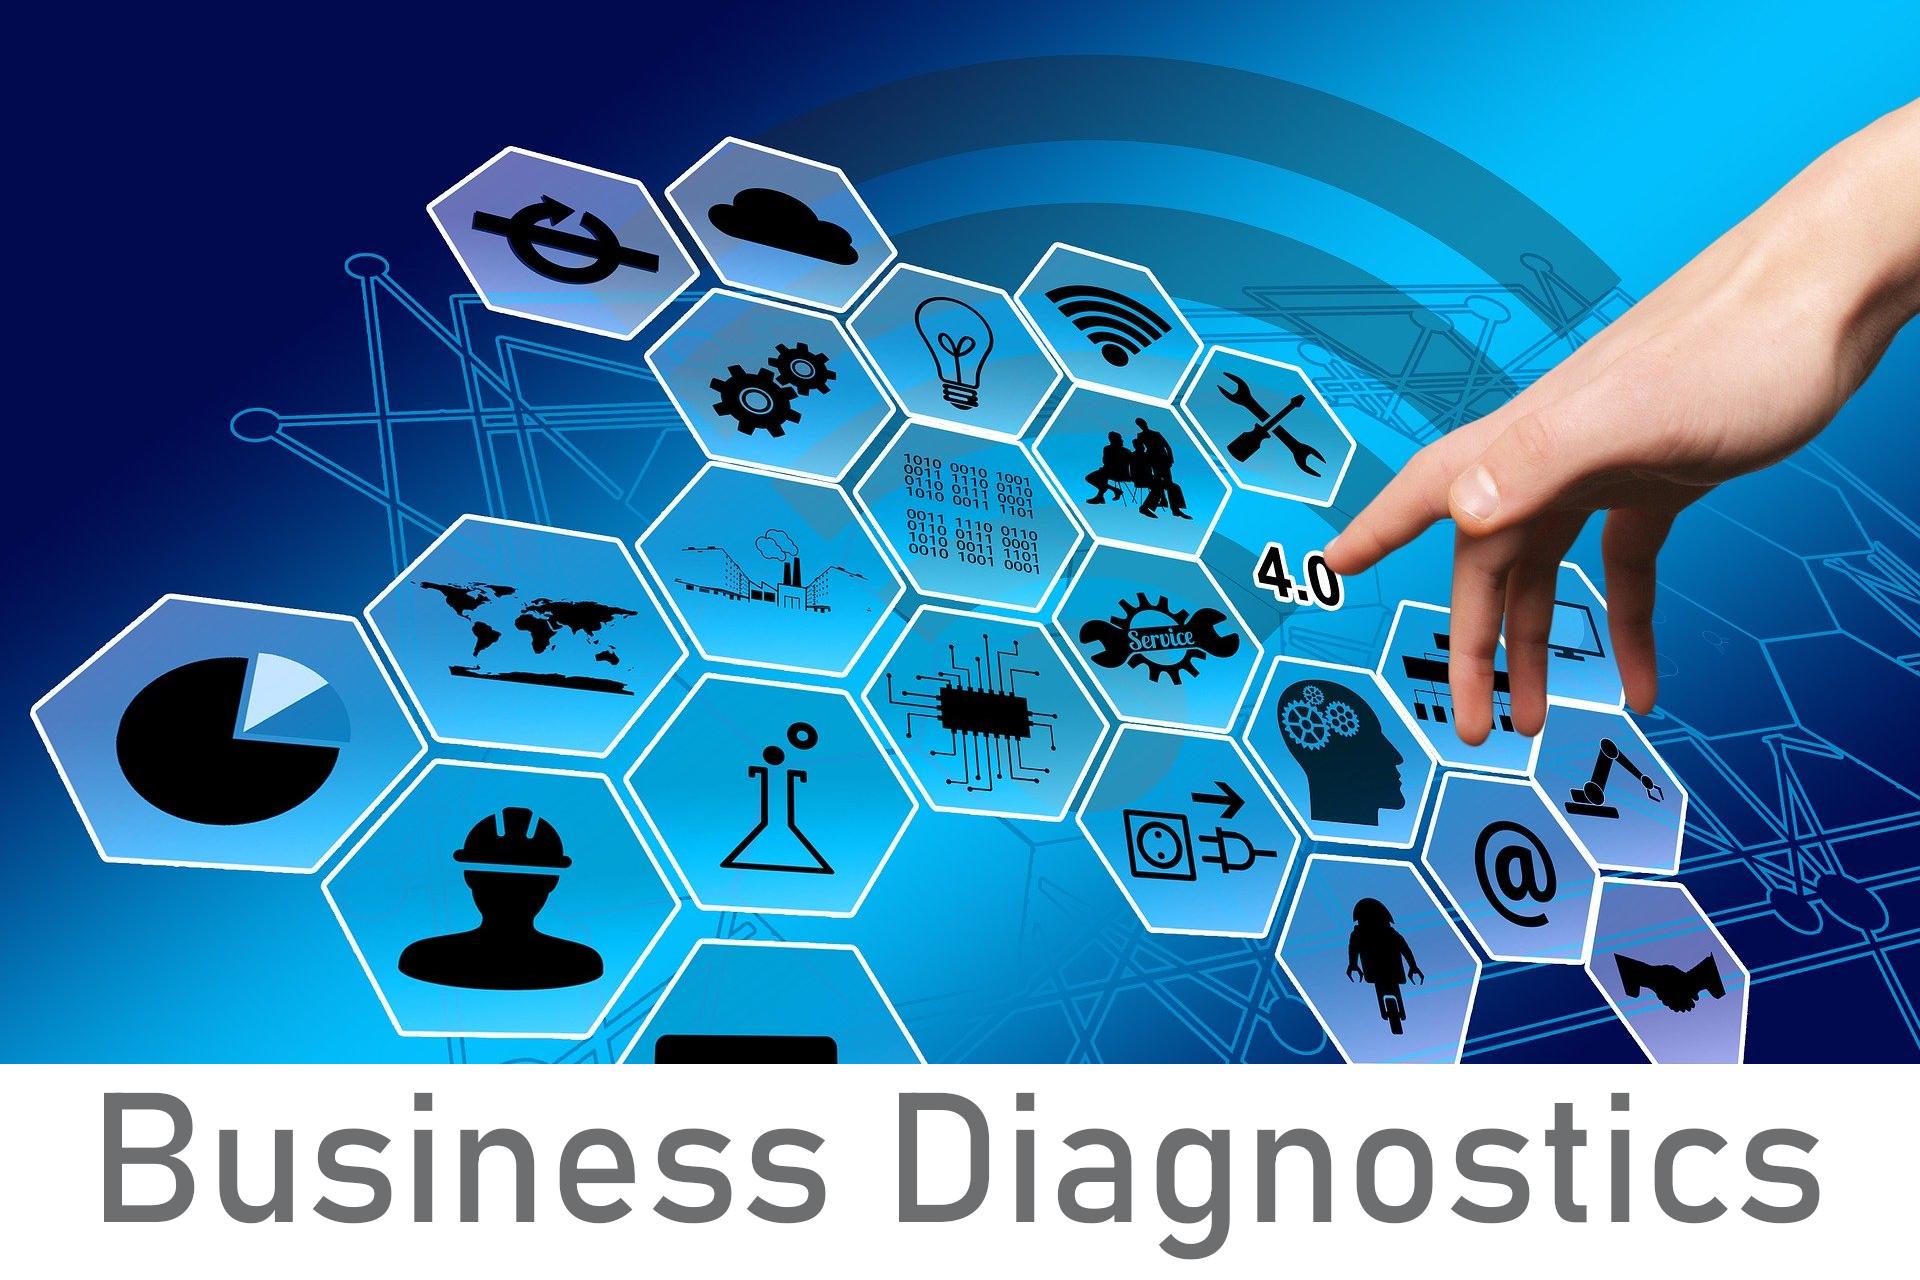 Business diagnostics